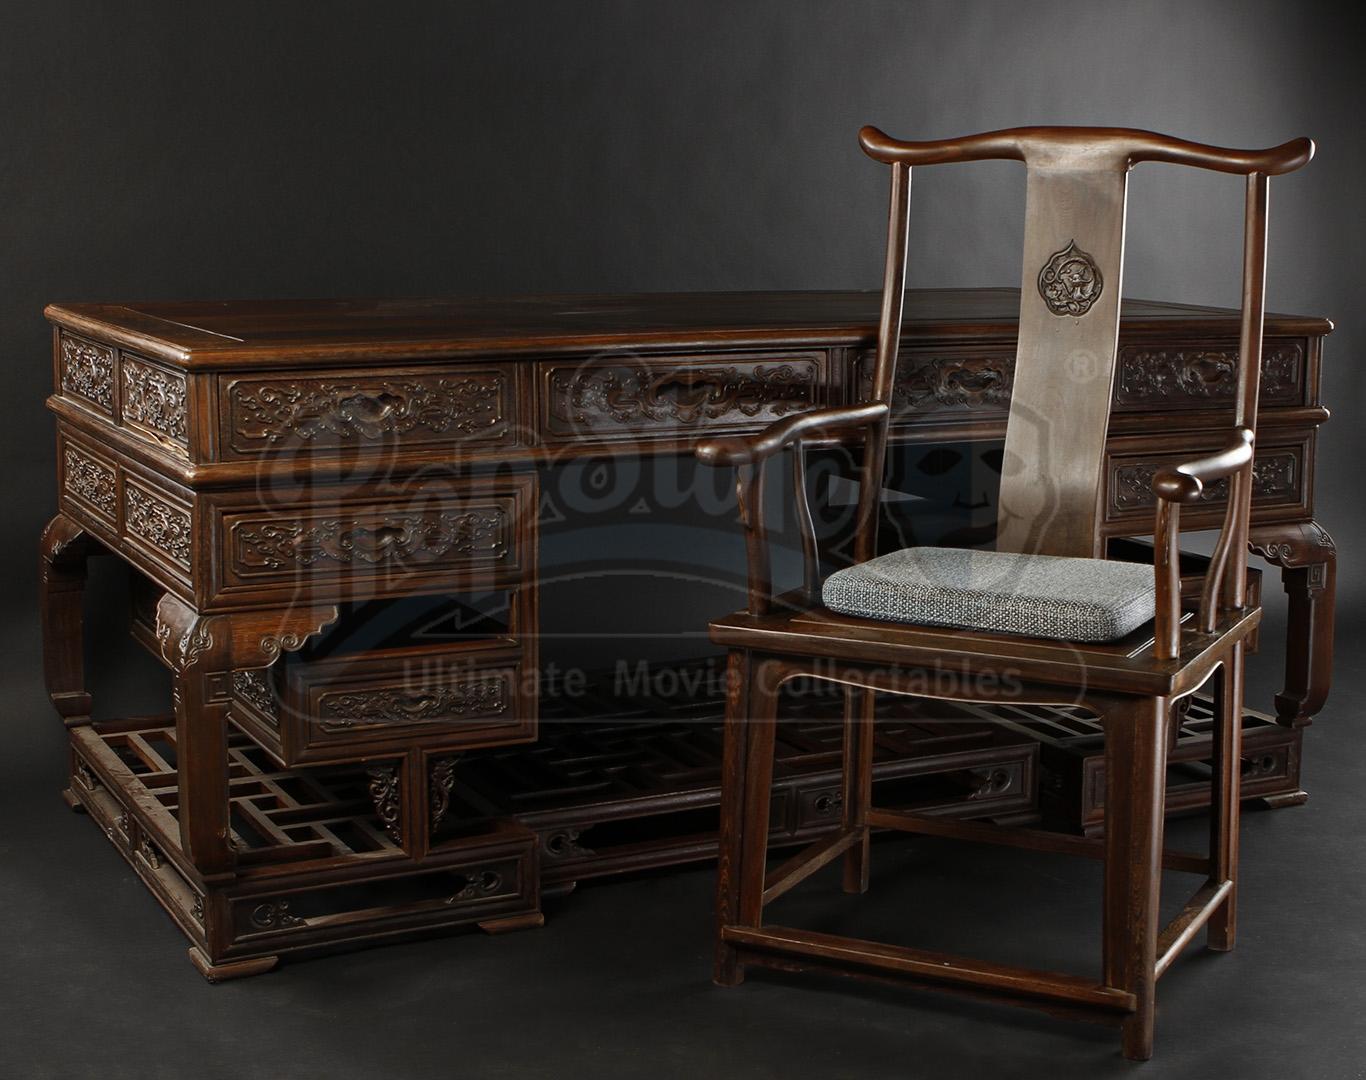 Pacific Rim Stacker Pentecost S Idris Elba Desk And Chair Current Price 1550